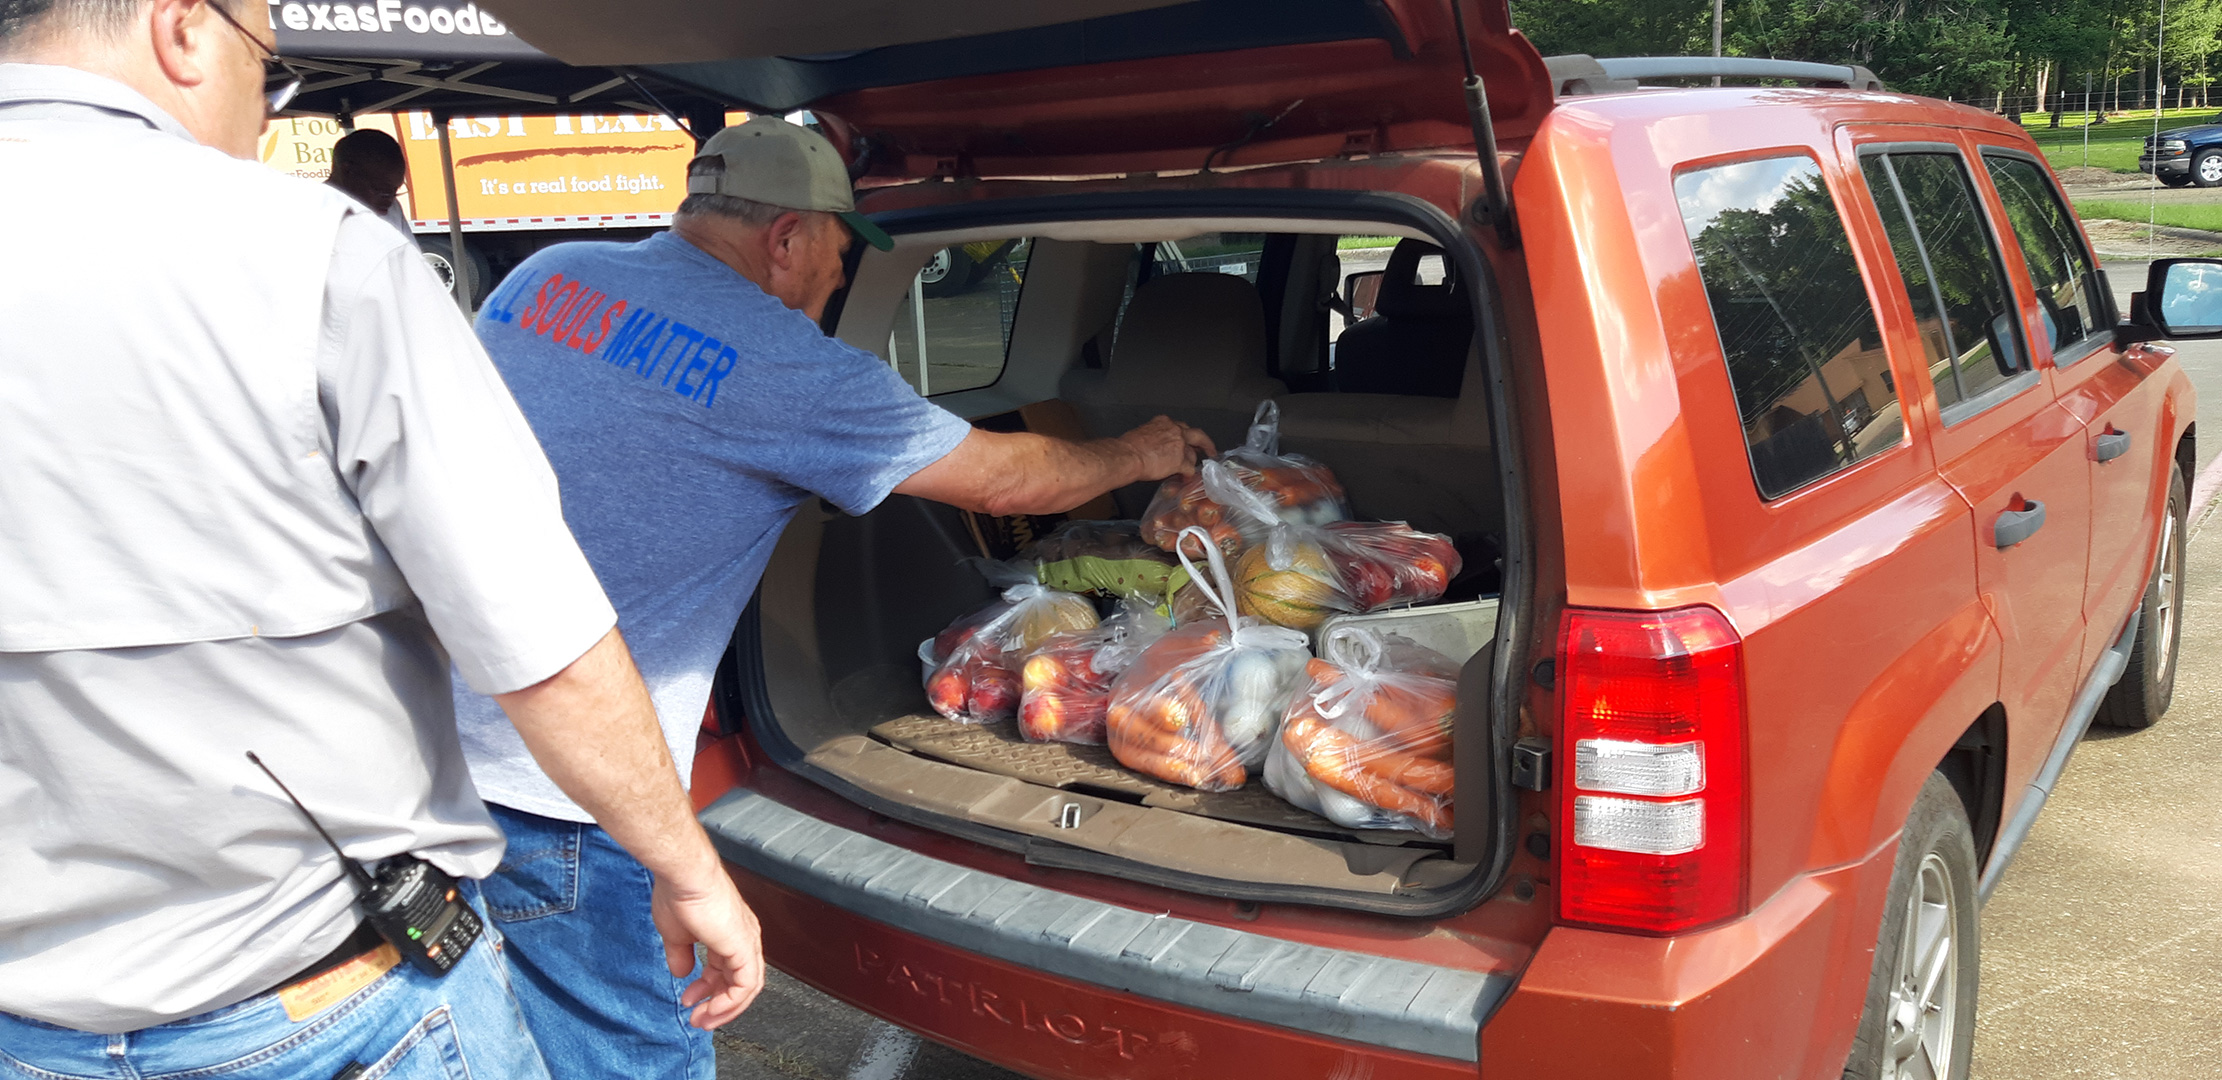 U.S. - Nash, Texas, charity distributes food Thursday at Masonic Lodge